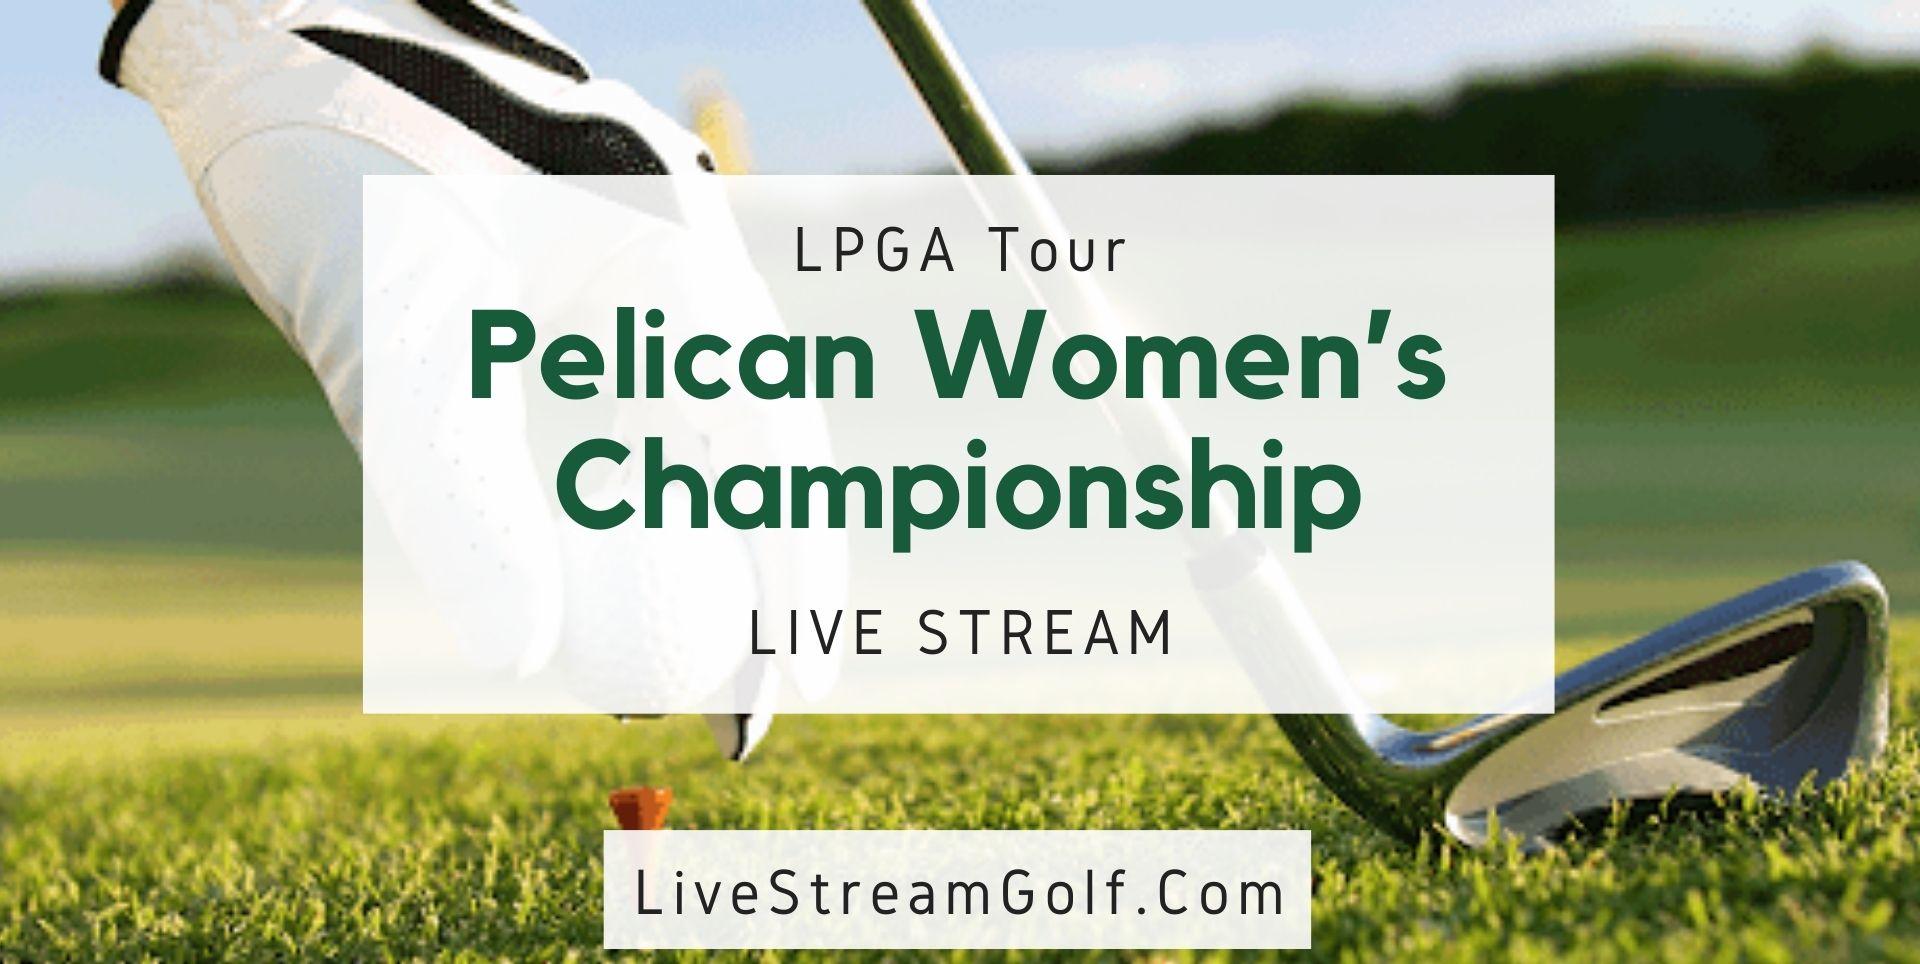 Pelican Women's Championship Rd 1 Live Stream: LPGA 2021